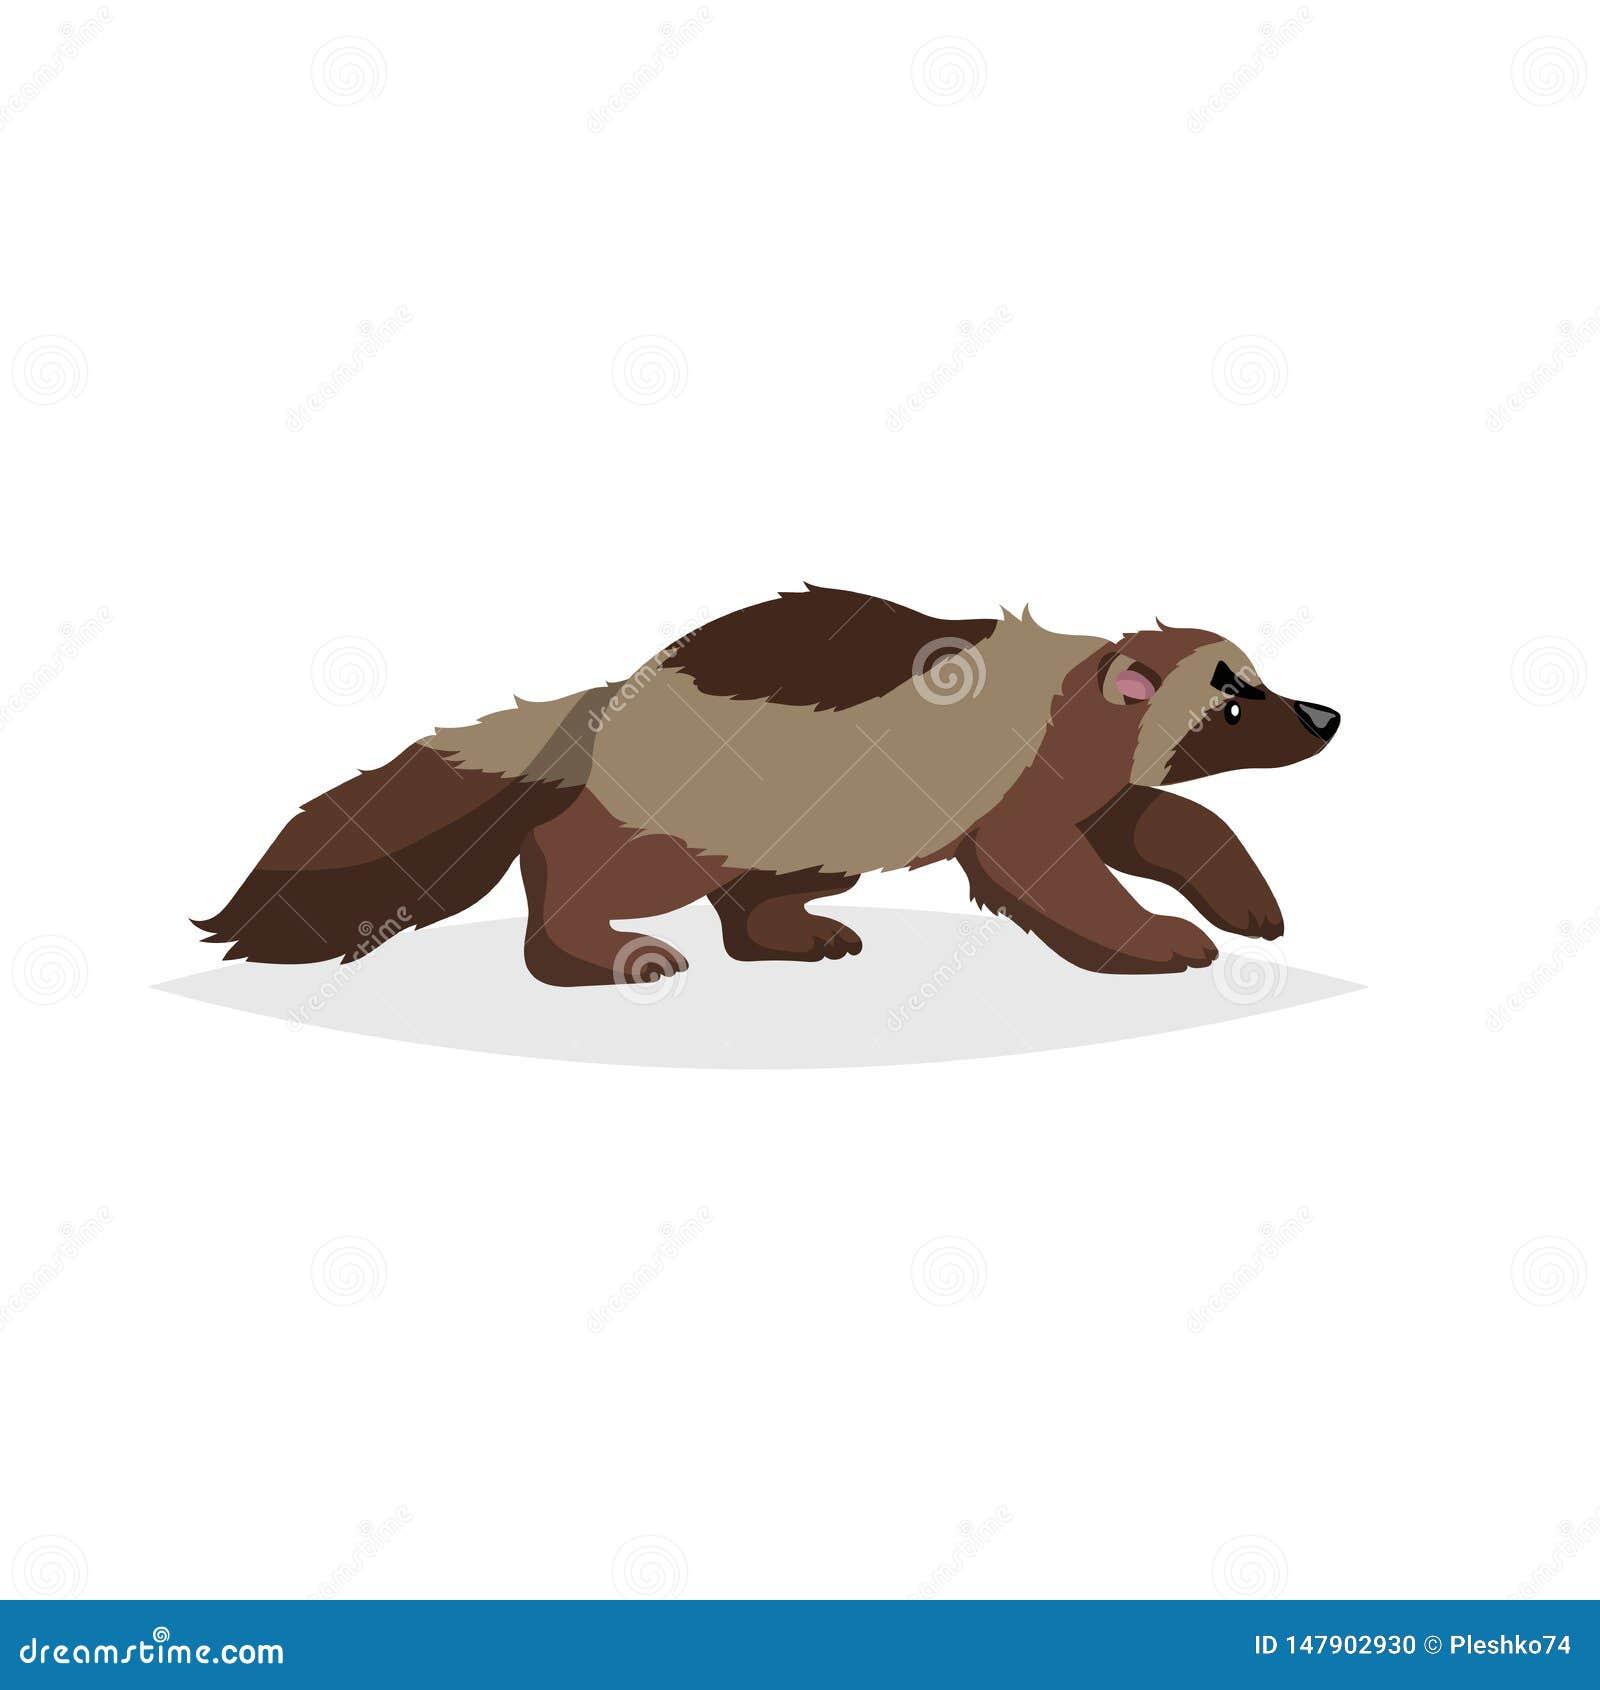 росомаха картинка животного мгновенный займ онлайн на киви